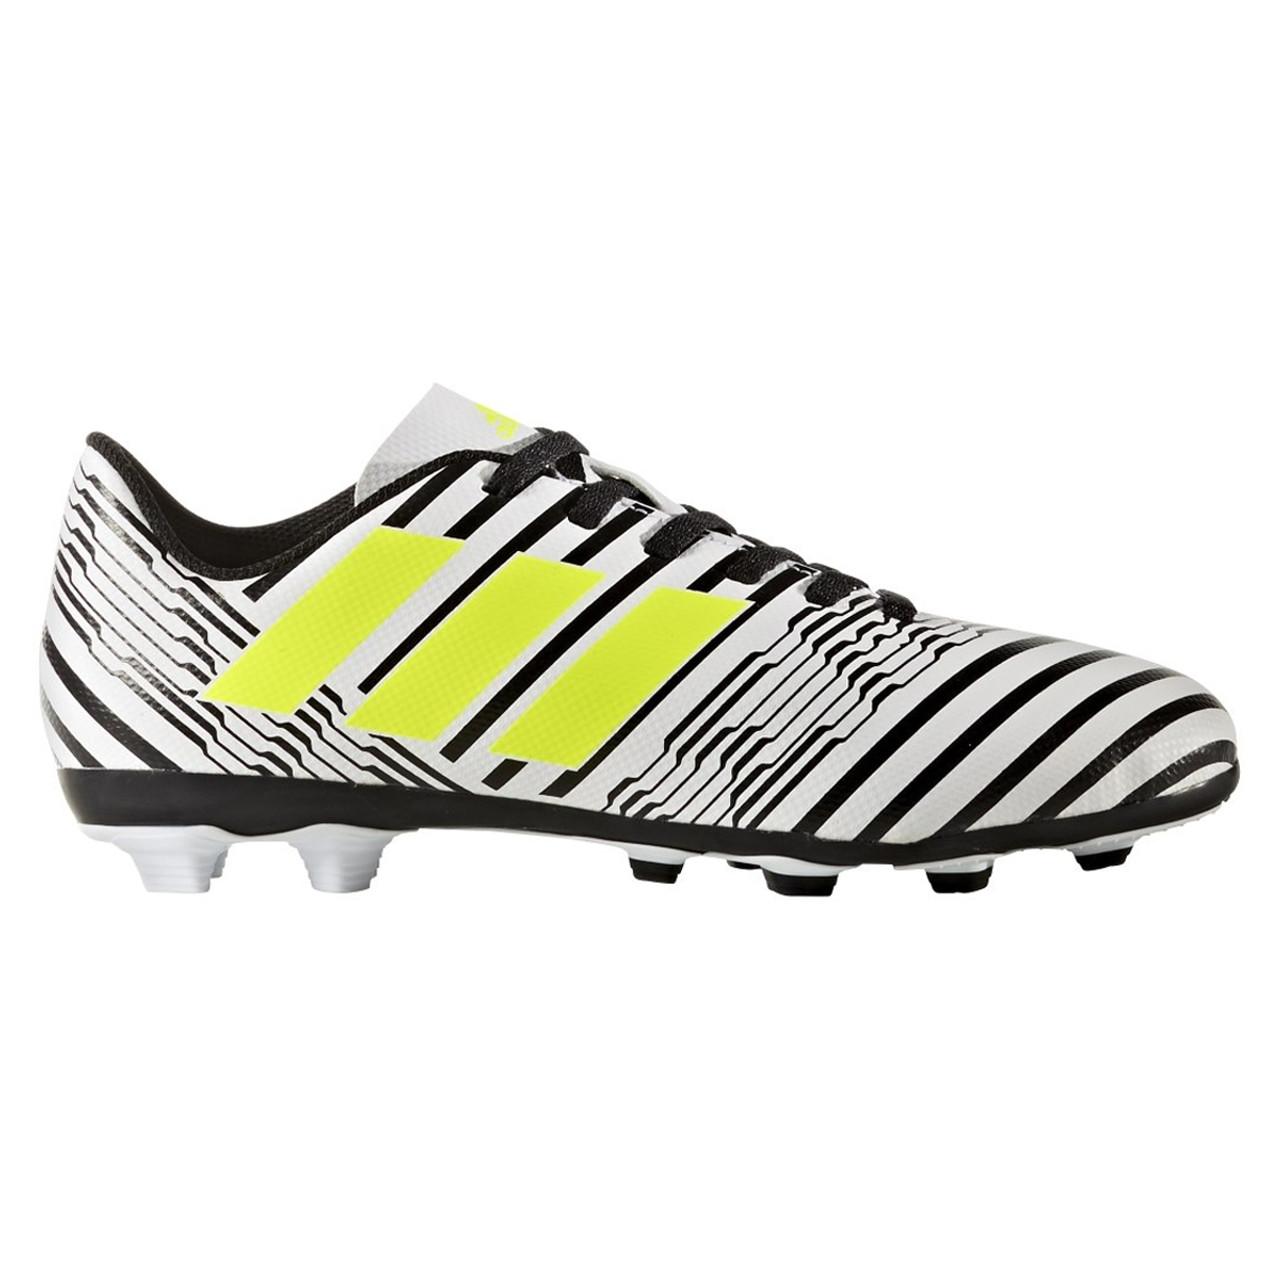 f731b2755 Adidas Nemeziz 17.4 FxG Junior Soccer Cleats S82459 - White Solar ...